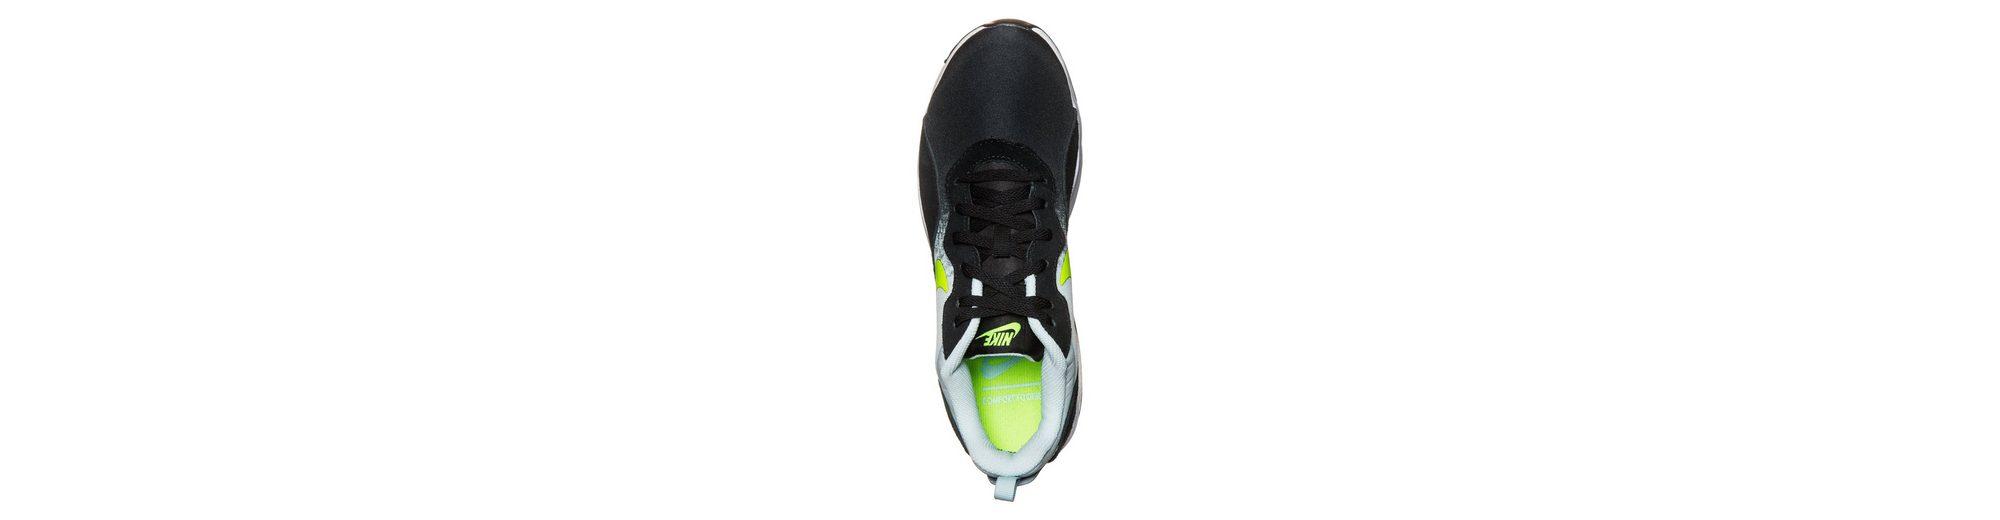 Verkauf Beliebt Nike Sportswear LD Runner Sneaker Damen Günstig Kaufen 100% Authentisch 6nVghSYa